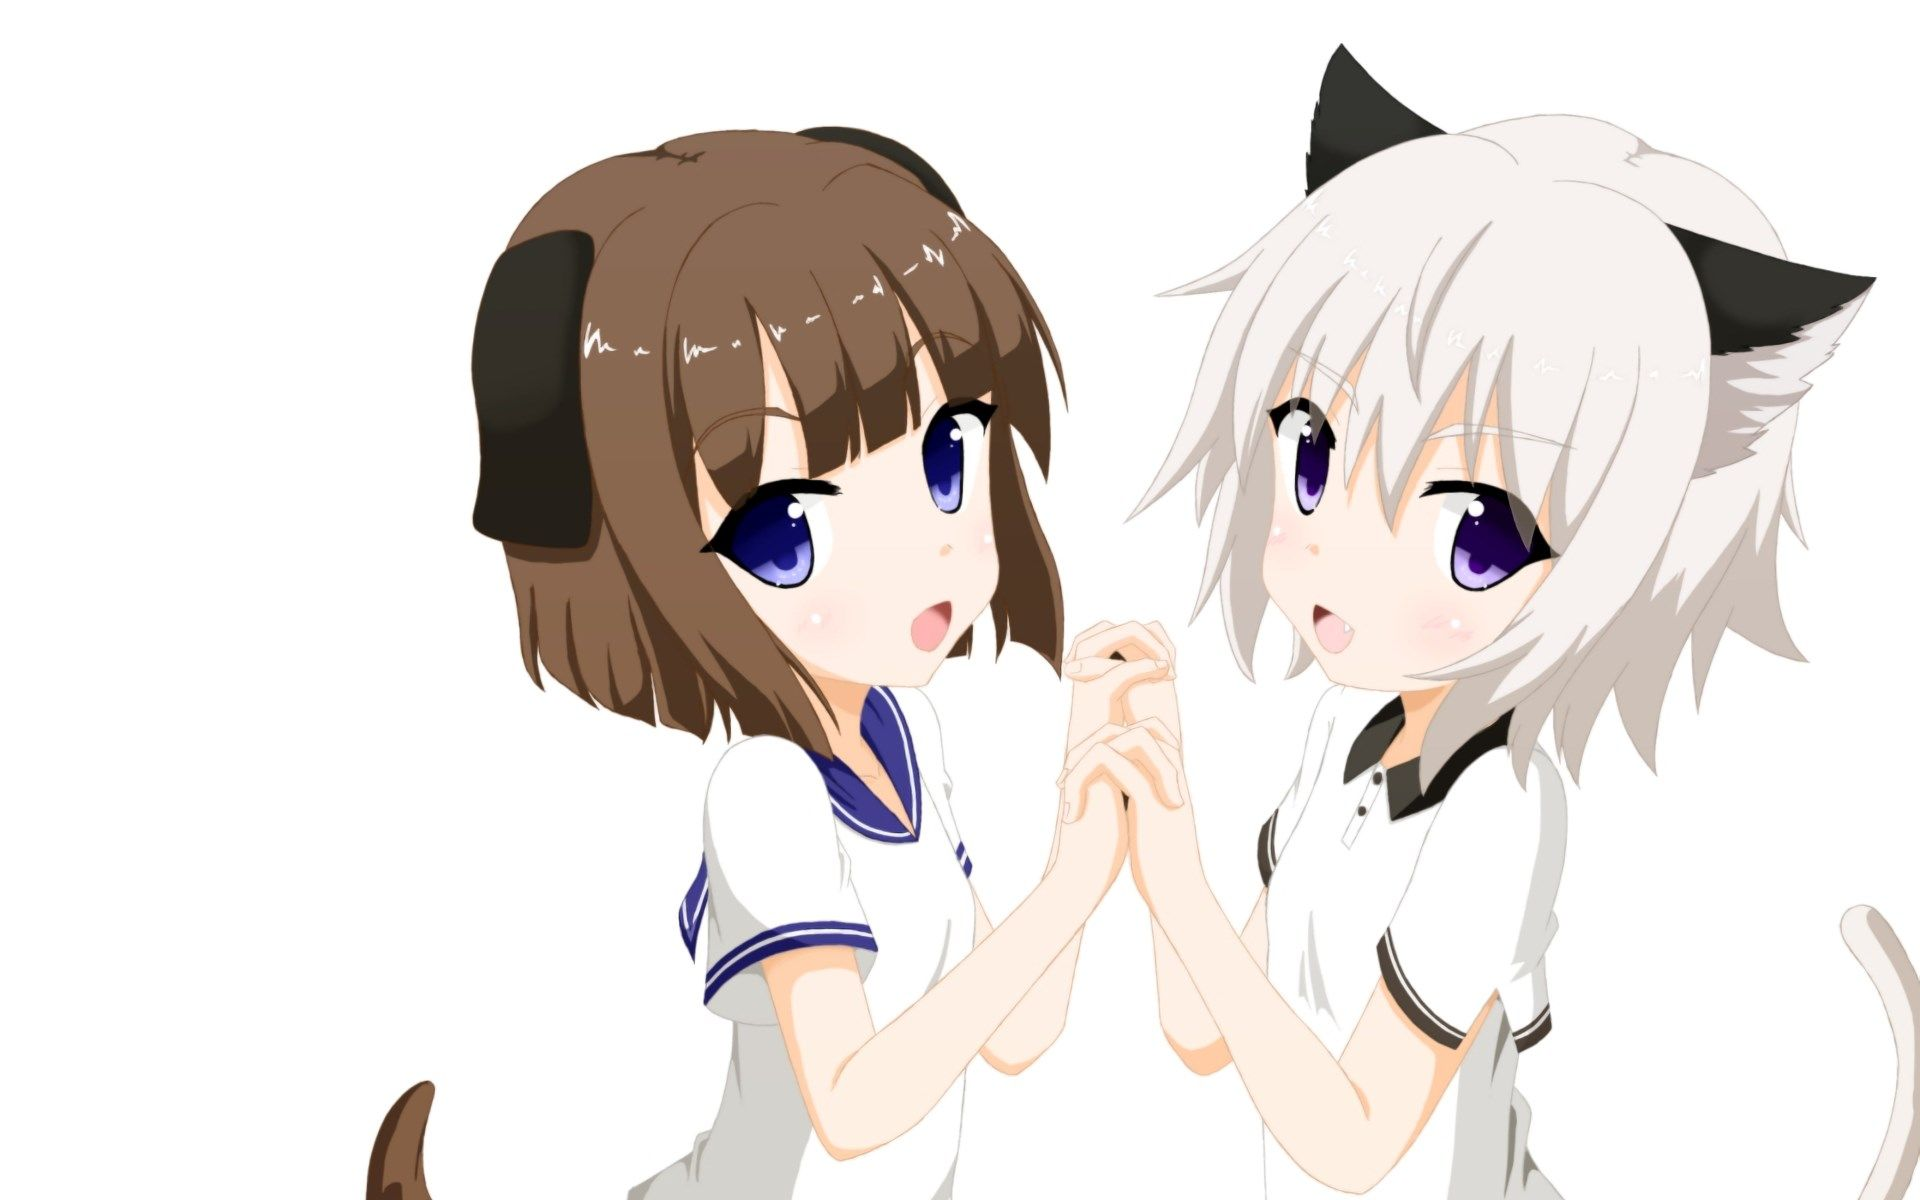 Beautiful Anime Image By C Matthews Anime Characters Anime Kara